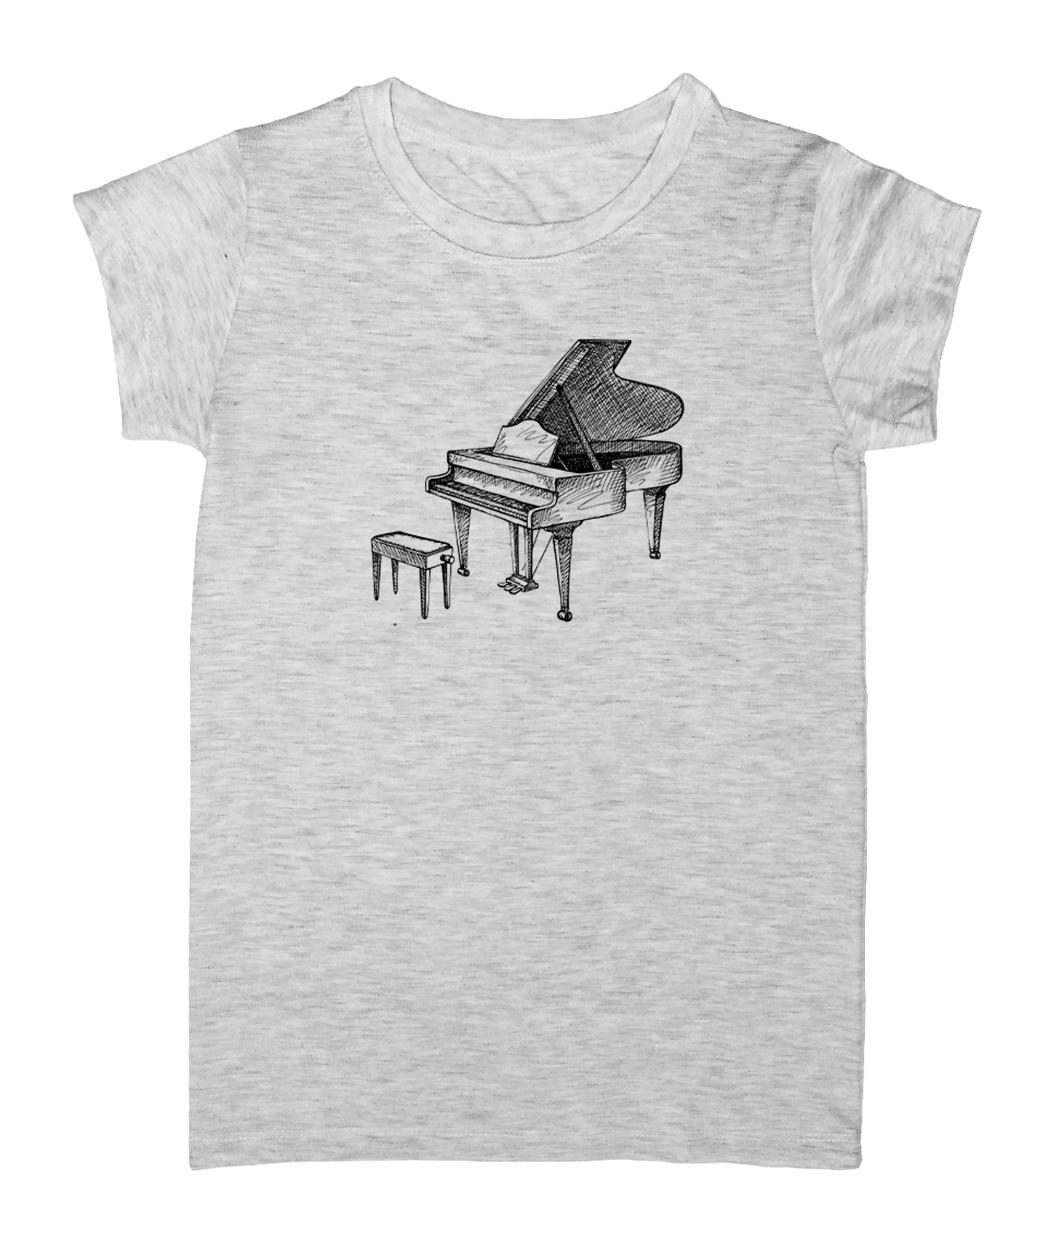 تصویر تیشرت زنانه طرح پیانو مدل EZM20